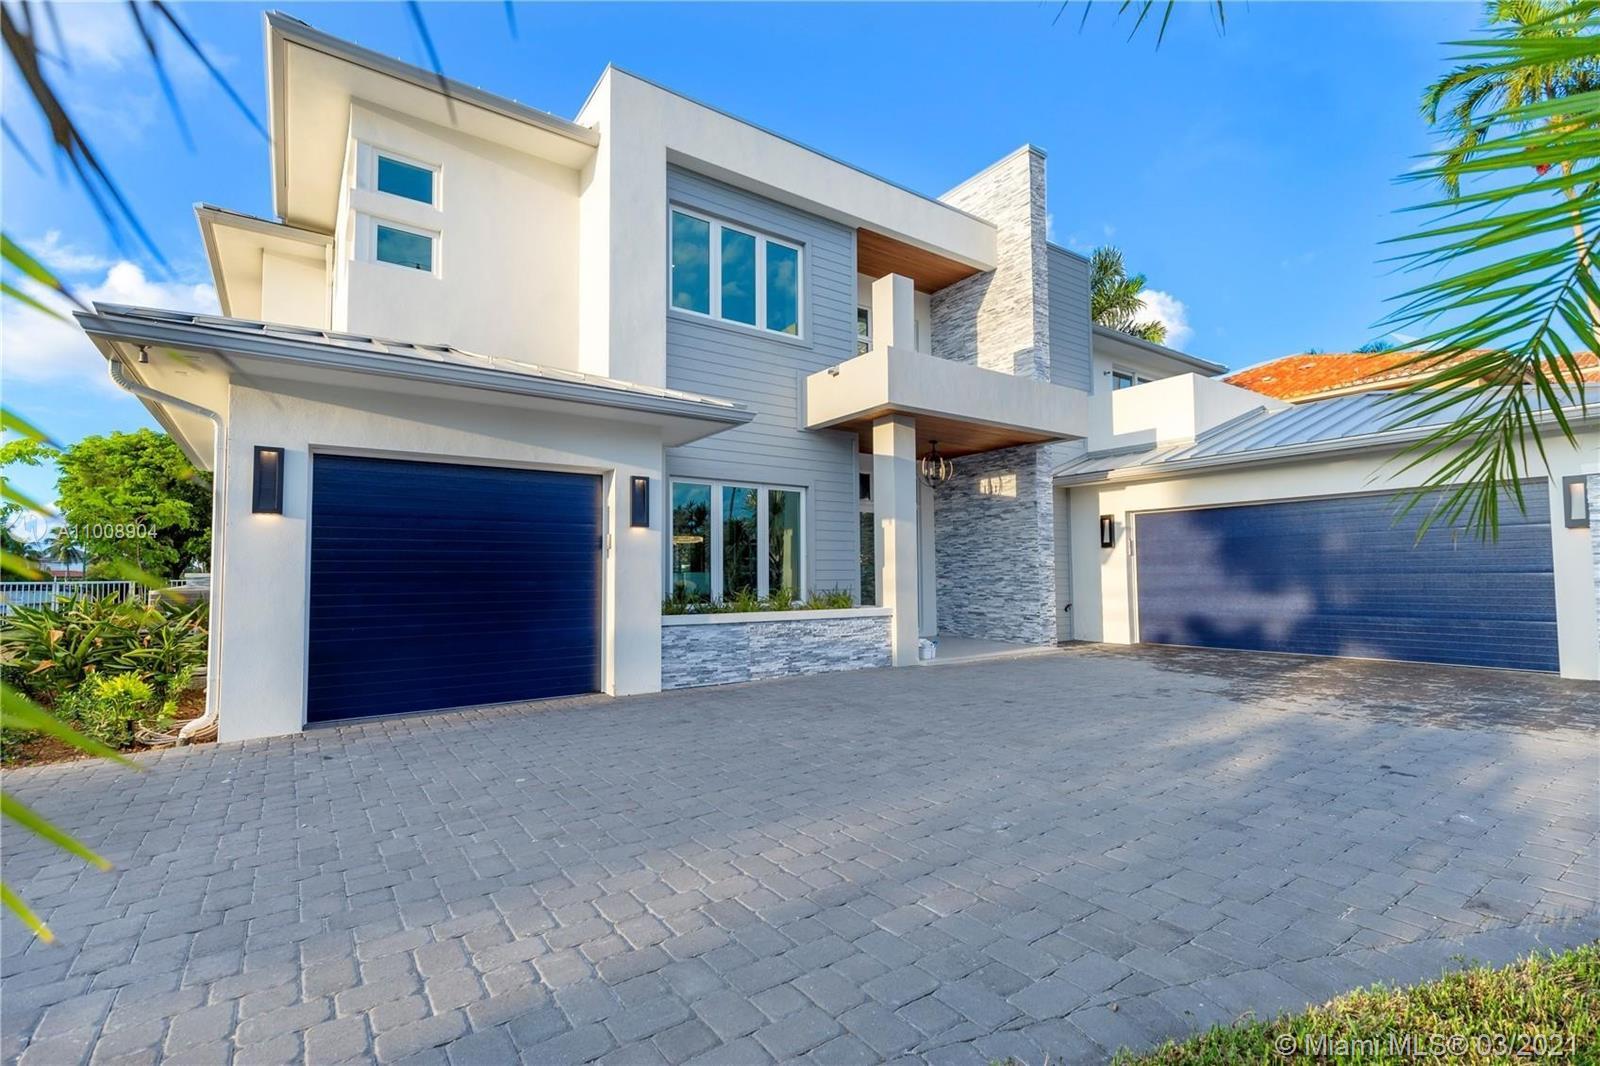 39 Pelican Dr Luxury Real Estate